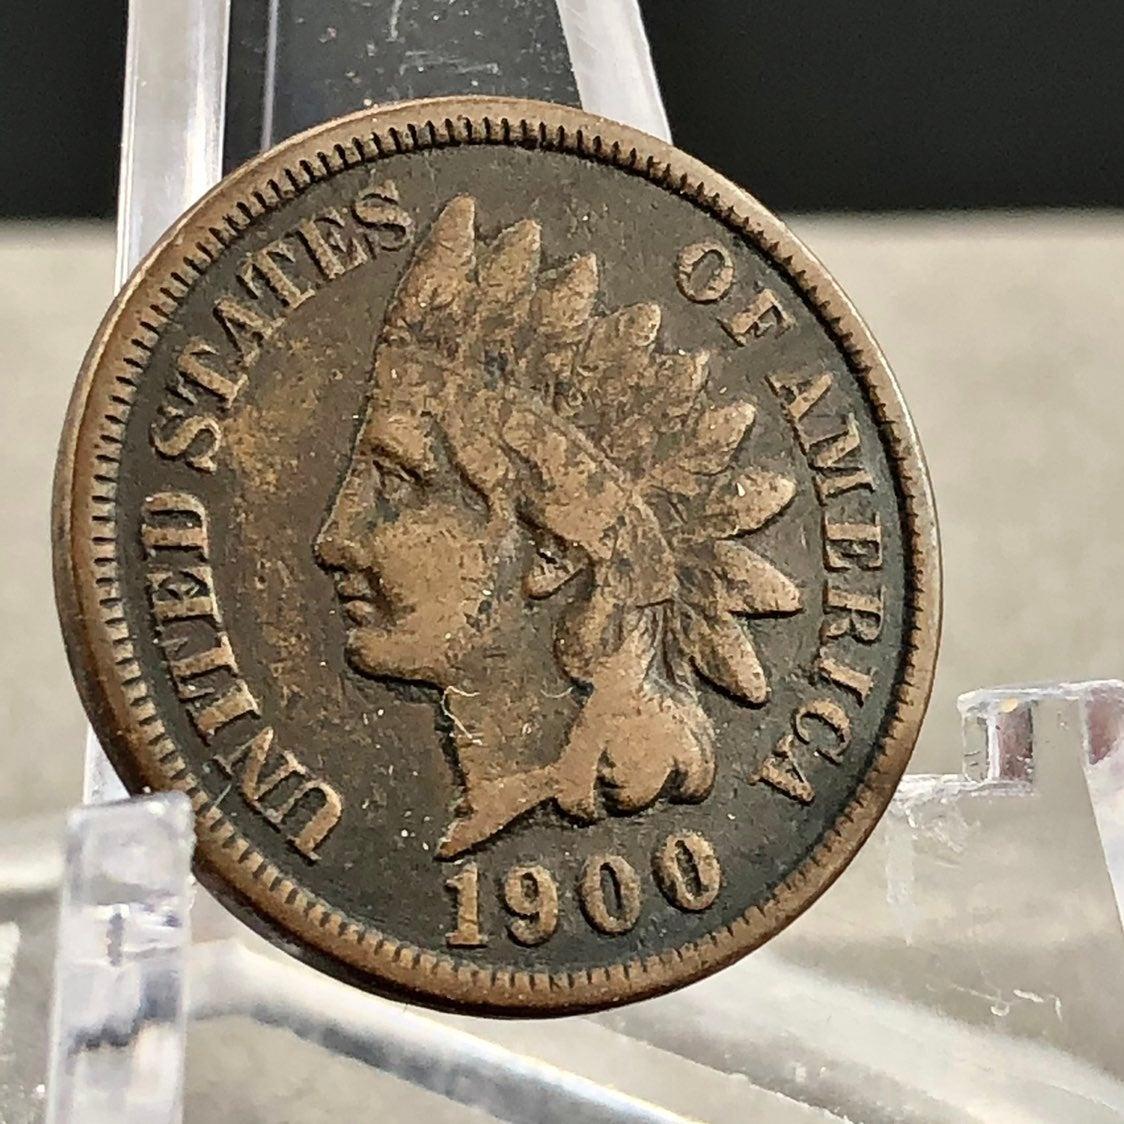 1900 Indian Head Penny Liberty